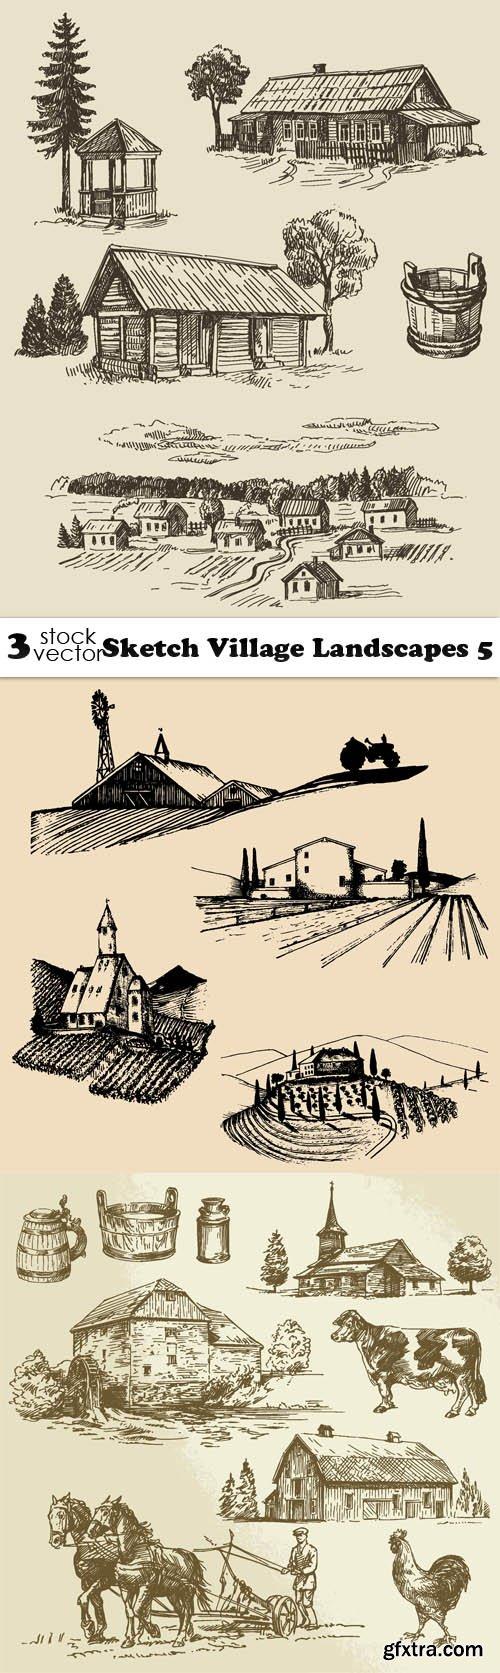 Vectors - Sketch Village Landscapes 5